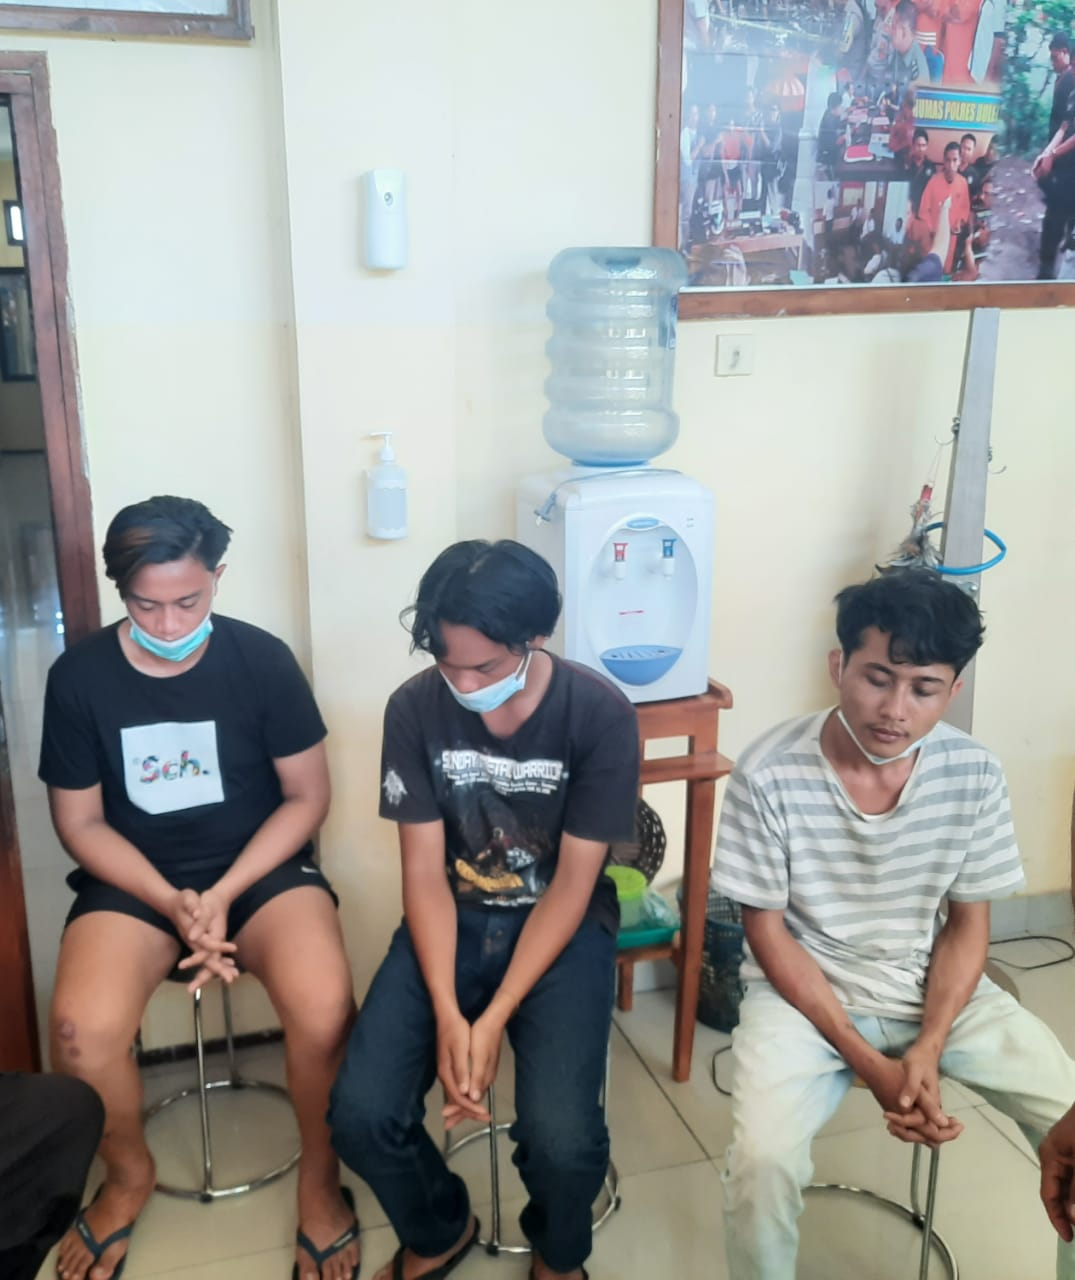 Polsek Seririt Ringkus 3 Pelaku Pencuri Barang Elektronik Sekolah